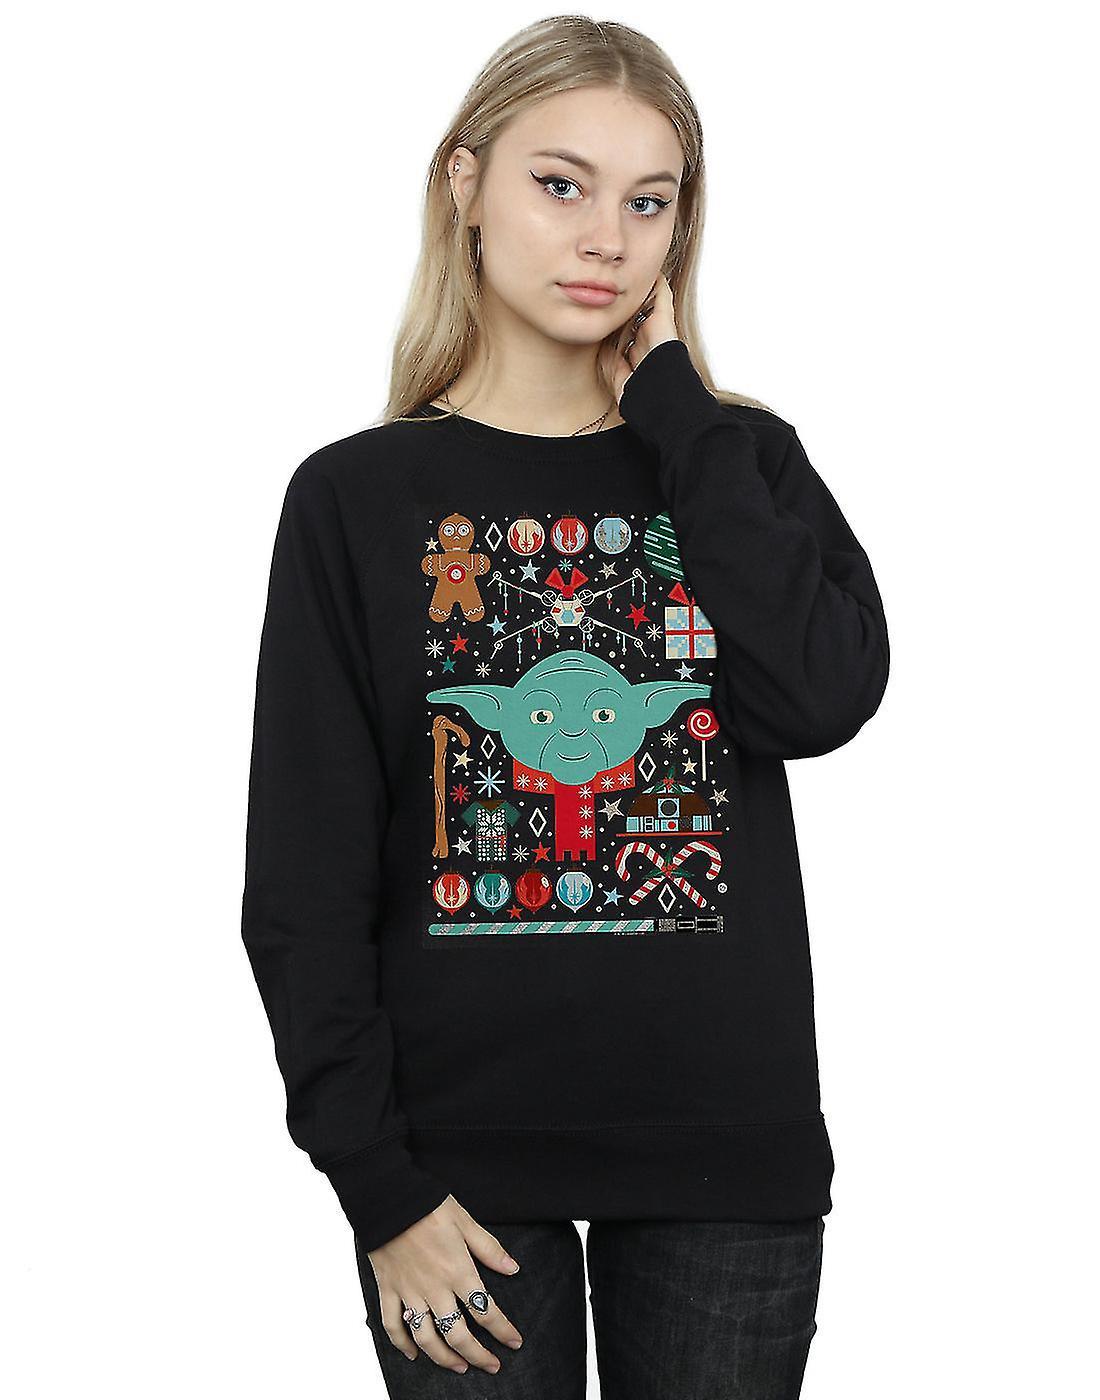 Star Wars Women's Yoda Christmas Sweatshirt